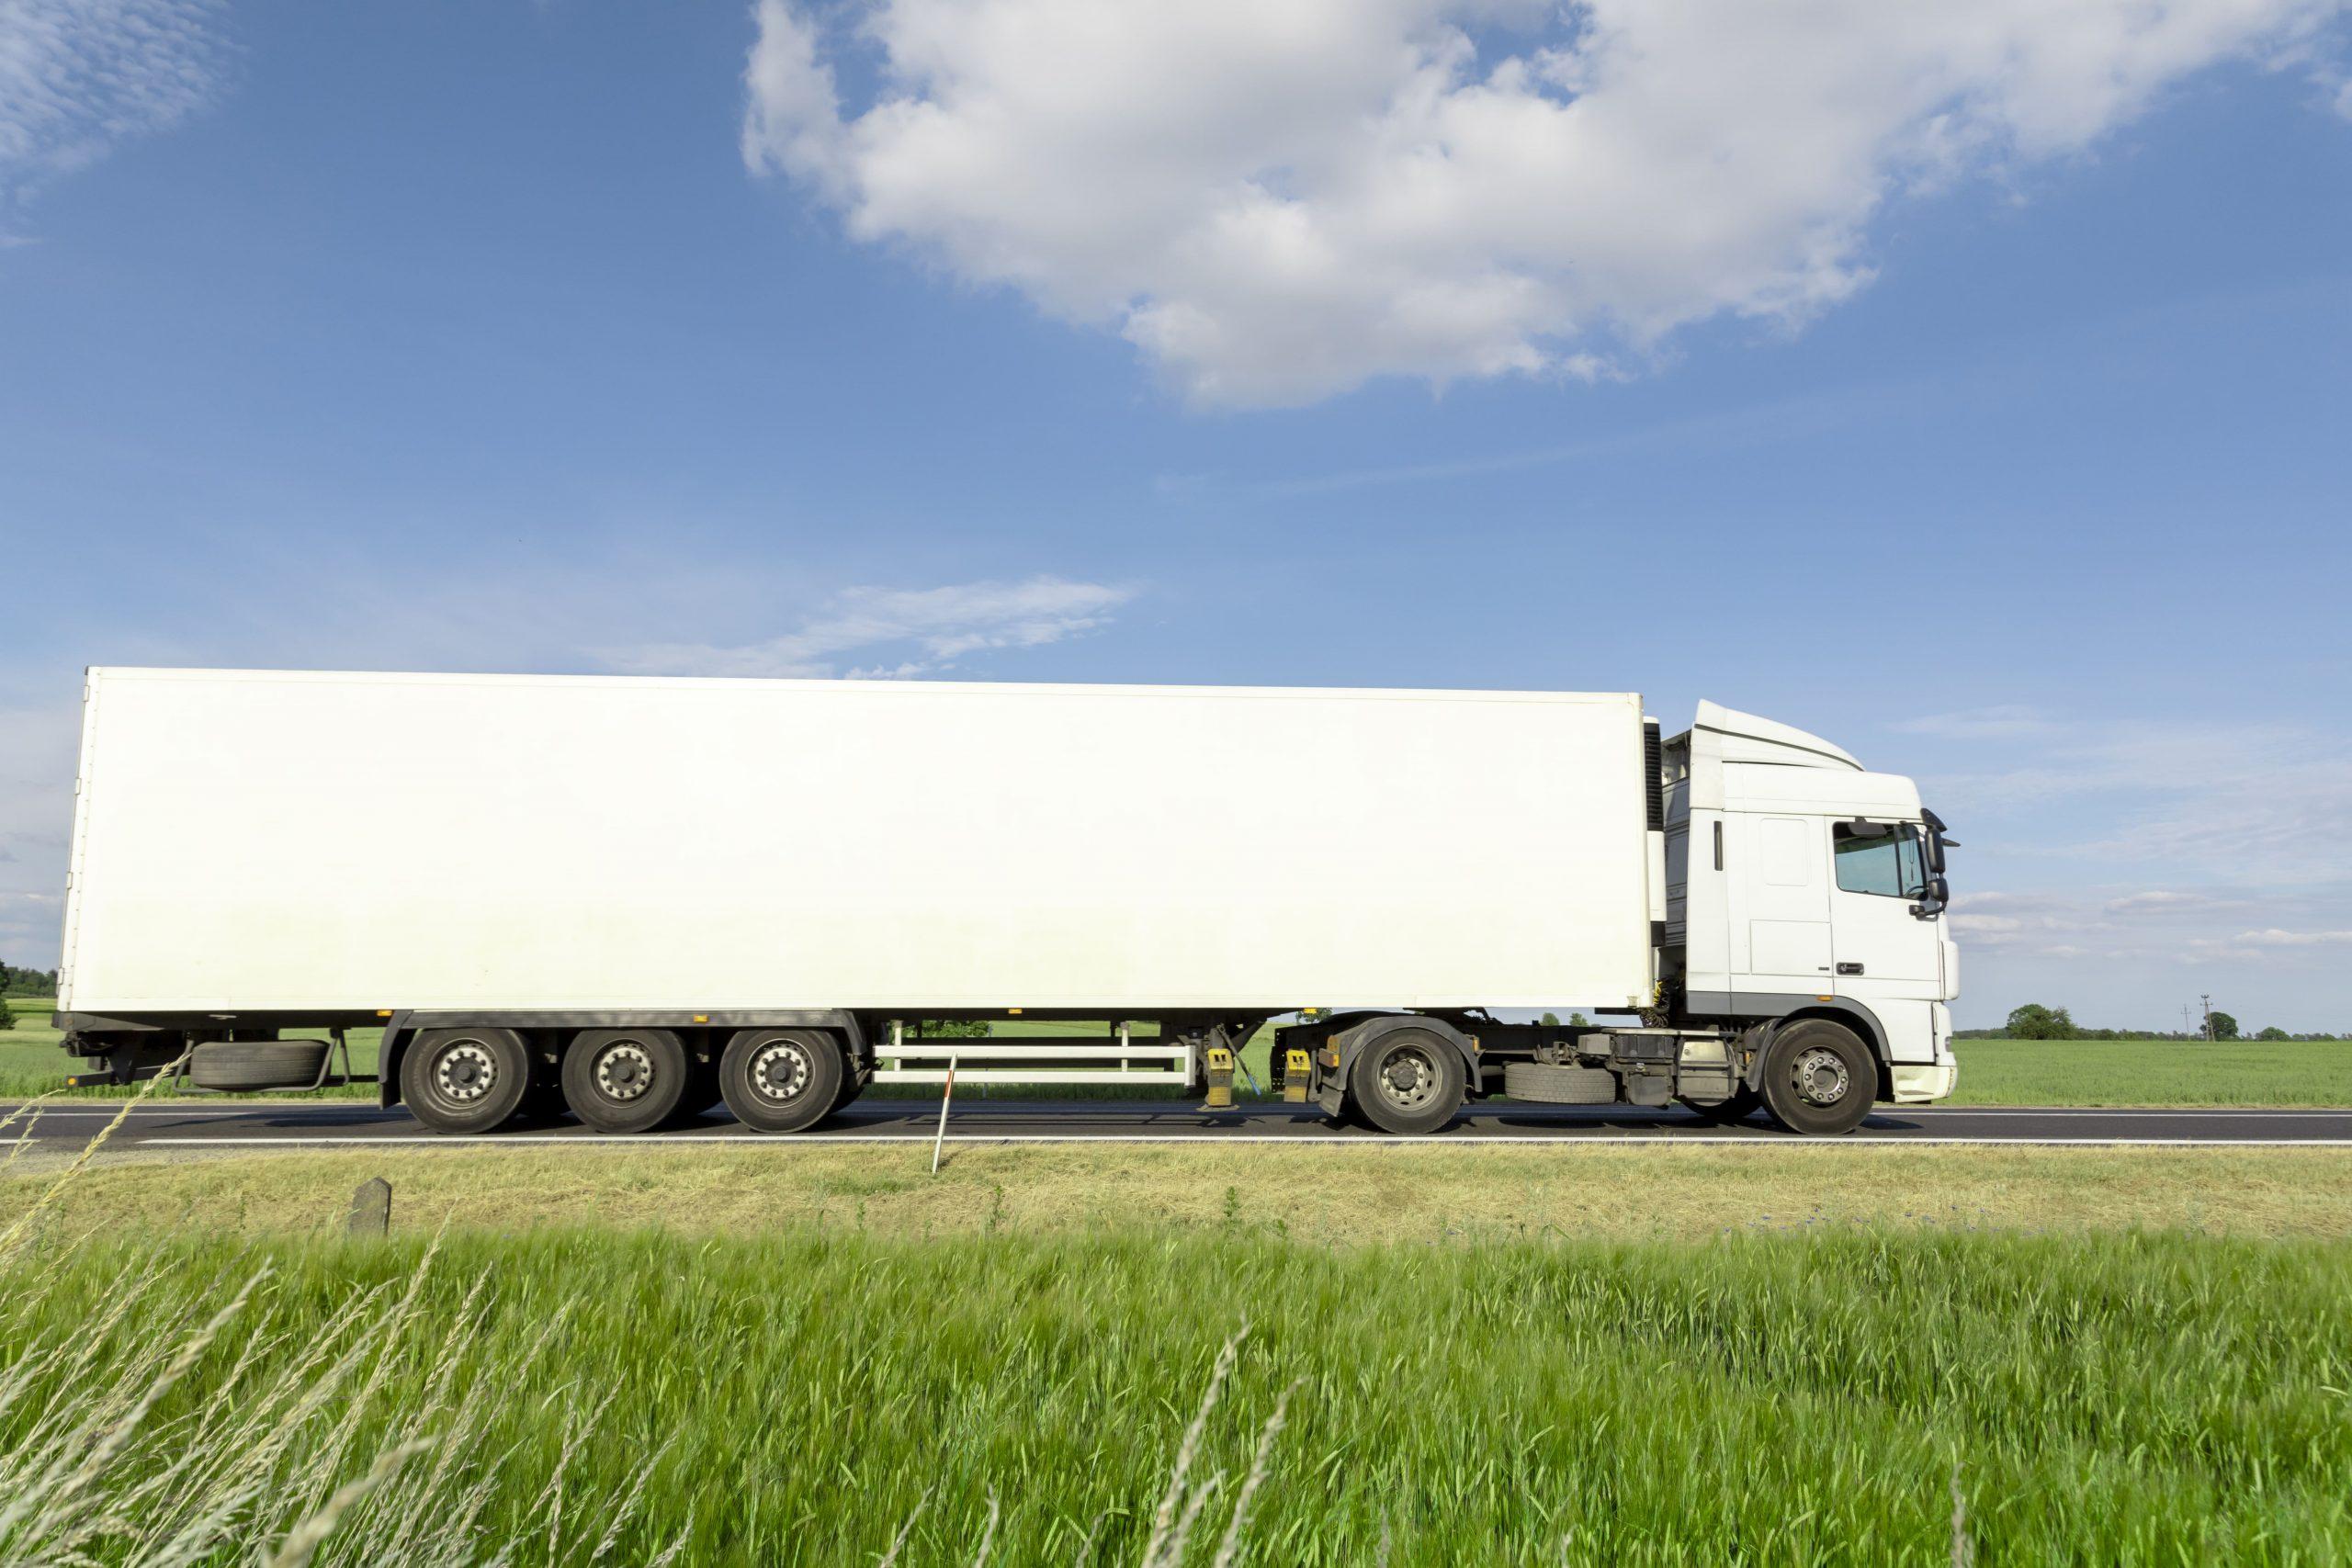 transportation-truck-on-the-road-SB7UA2Z-min